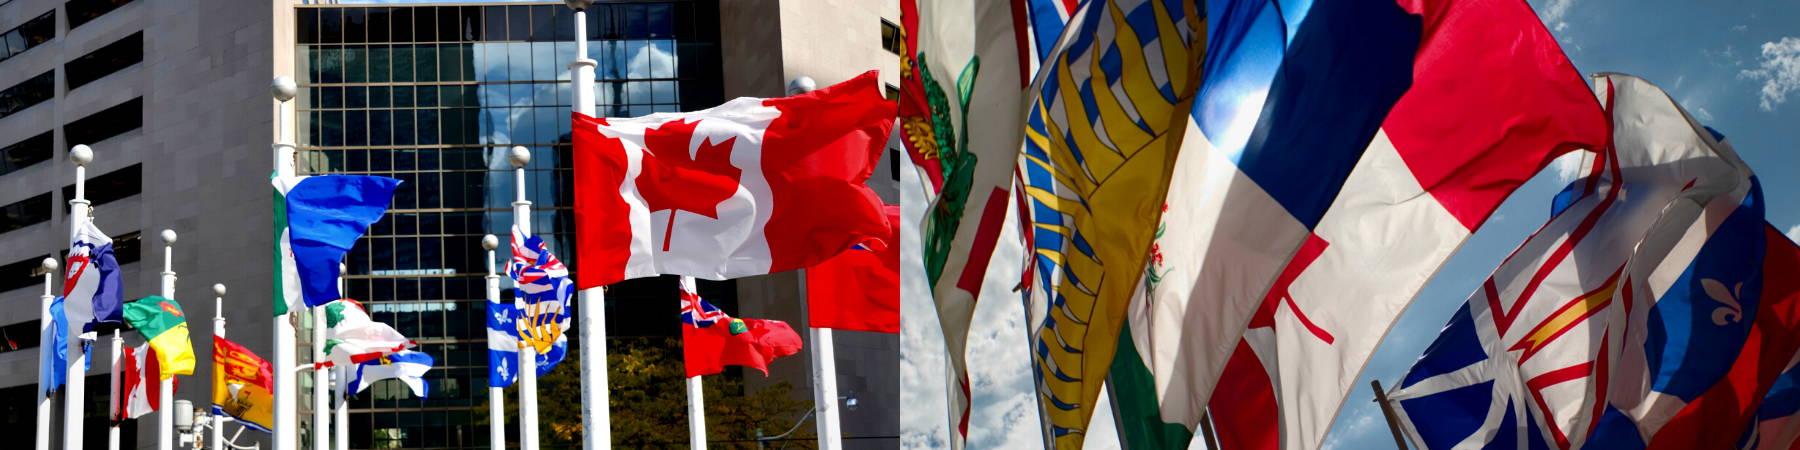 All our provincial flags at Canadiana Flag are made in Canada. Alberta flag, Manitoba flag, British Columbia, nova scotia flag, Saskatchewan flag, Canada flag, ONtario flag, New foundland flag, Quebec flag